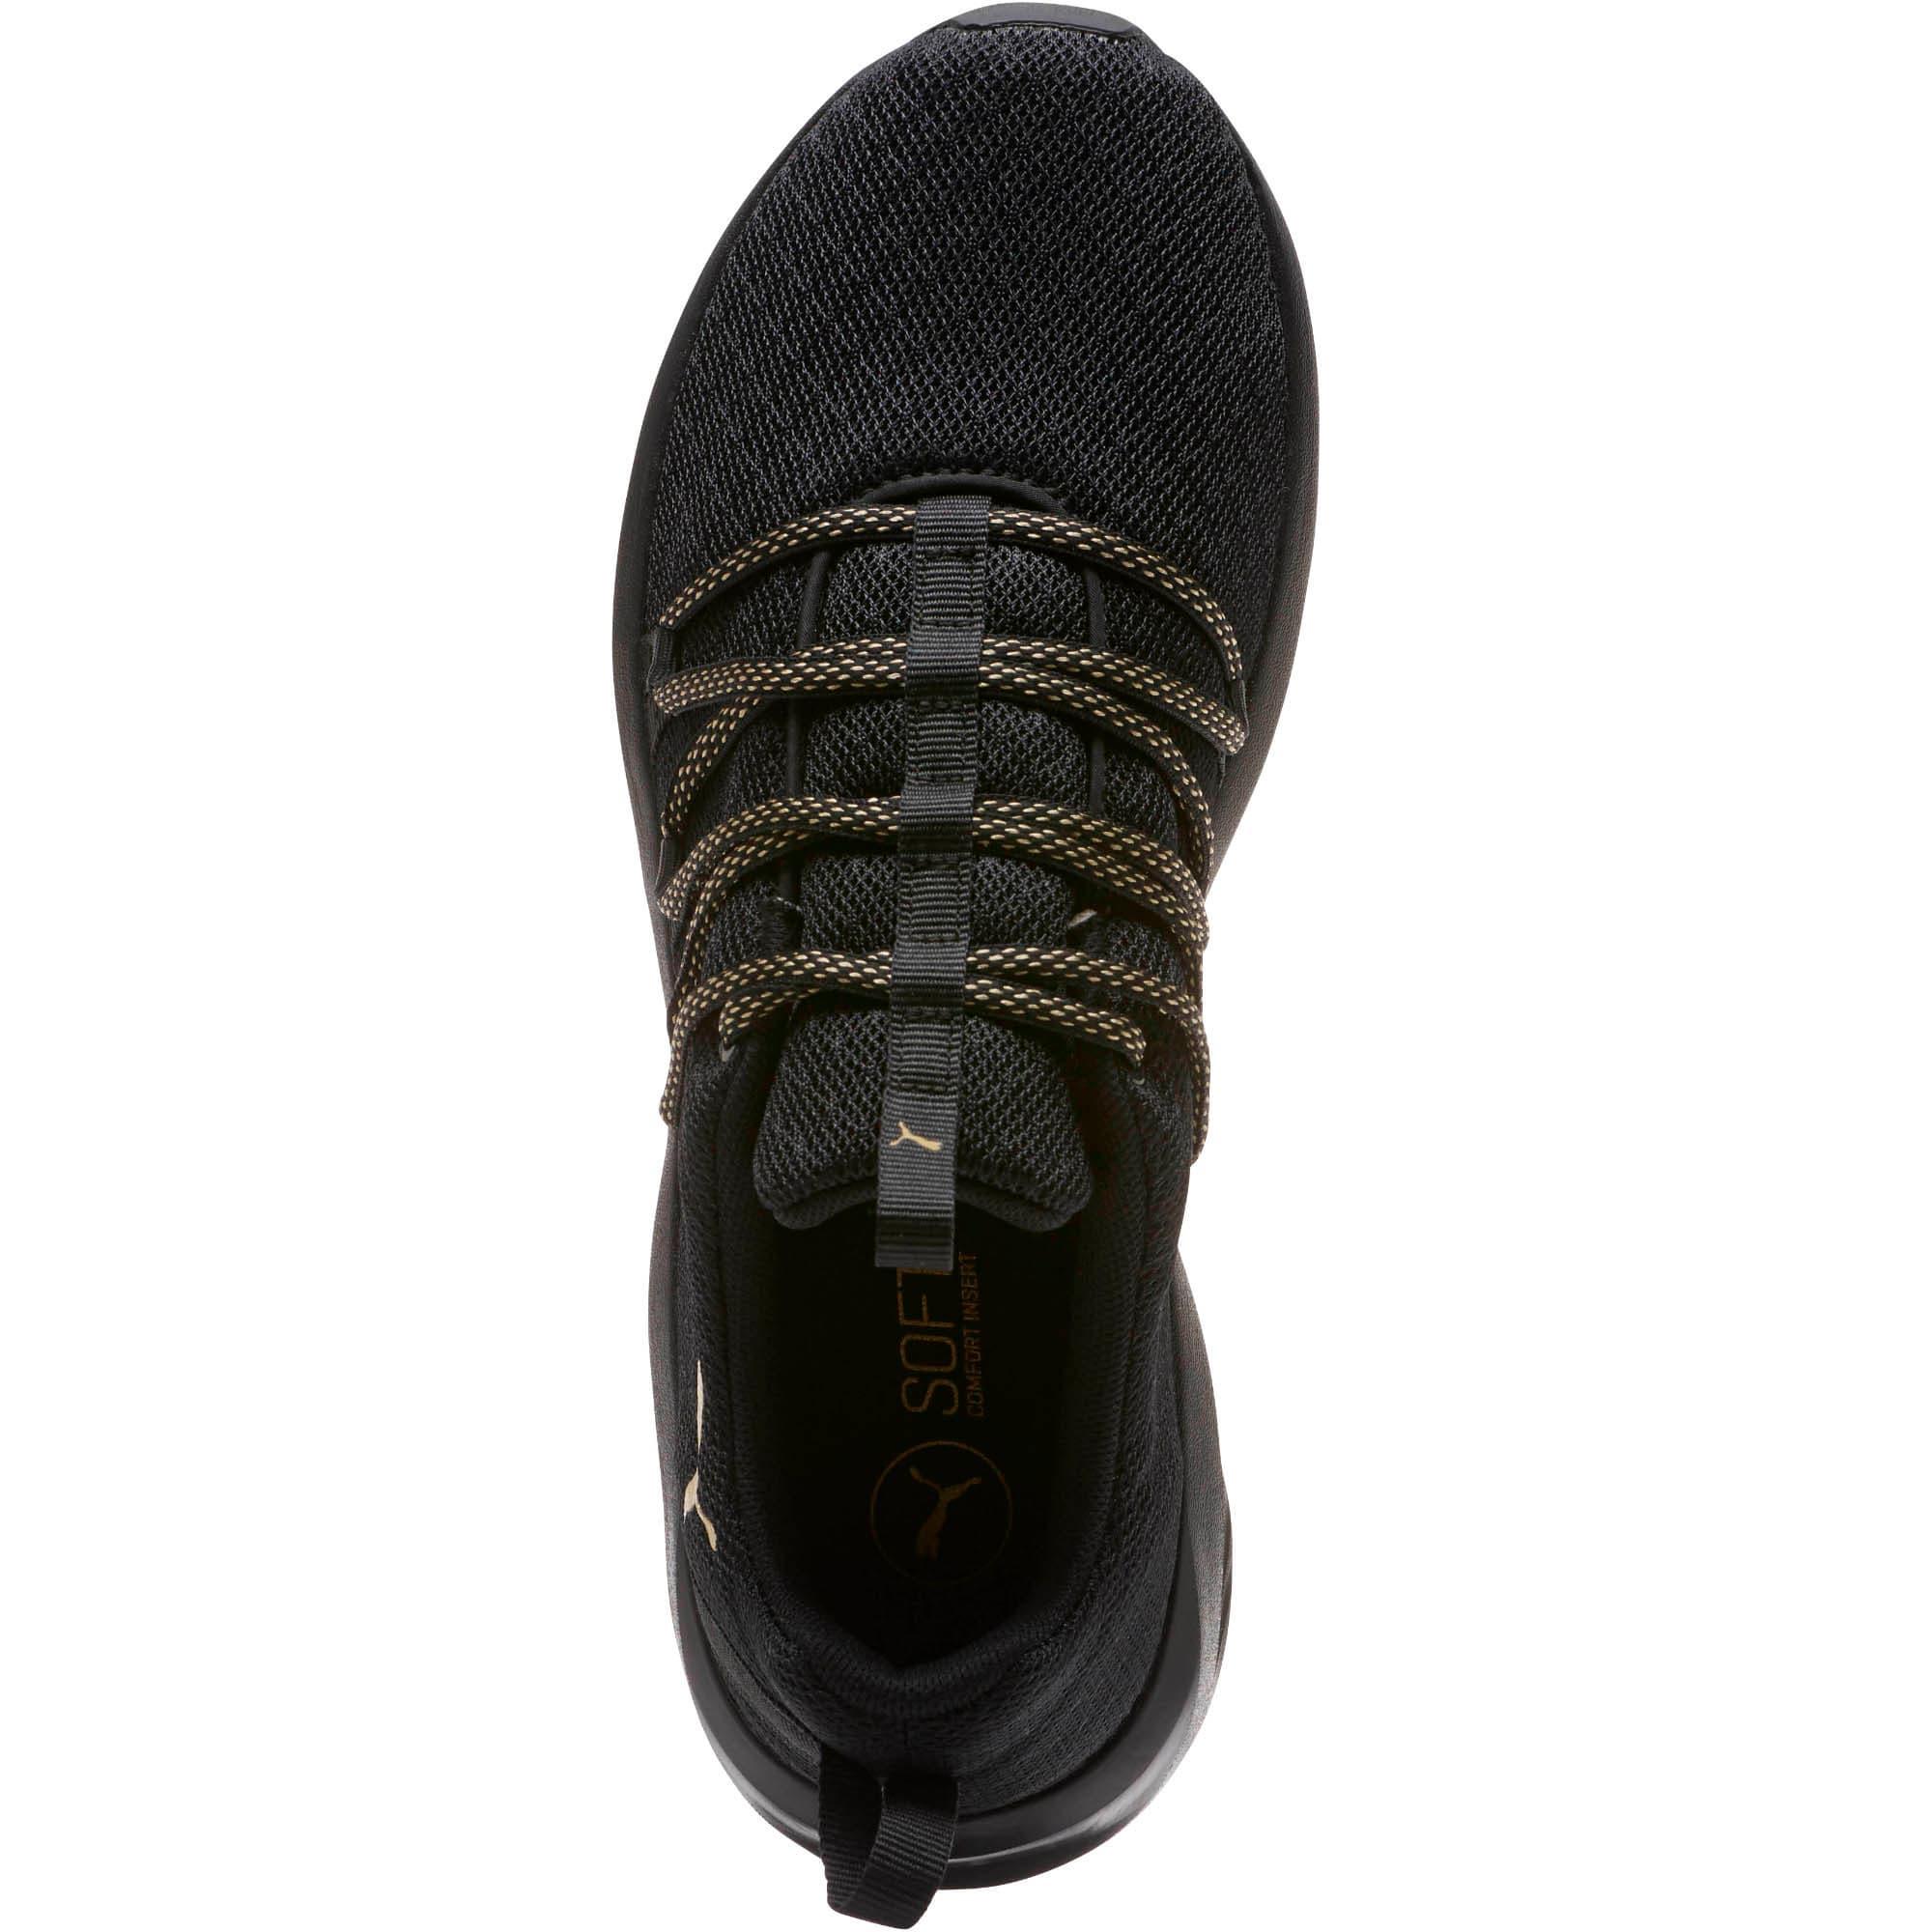 Thumbnail 5 of Prowl Alt Knit Mesh Women's Running Shoes, Puma Black-Metallic Gold, medium